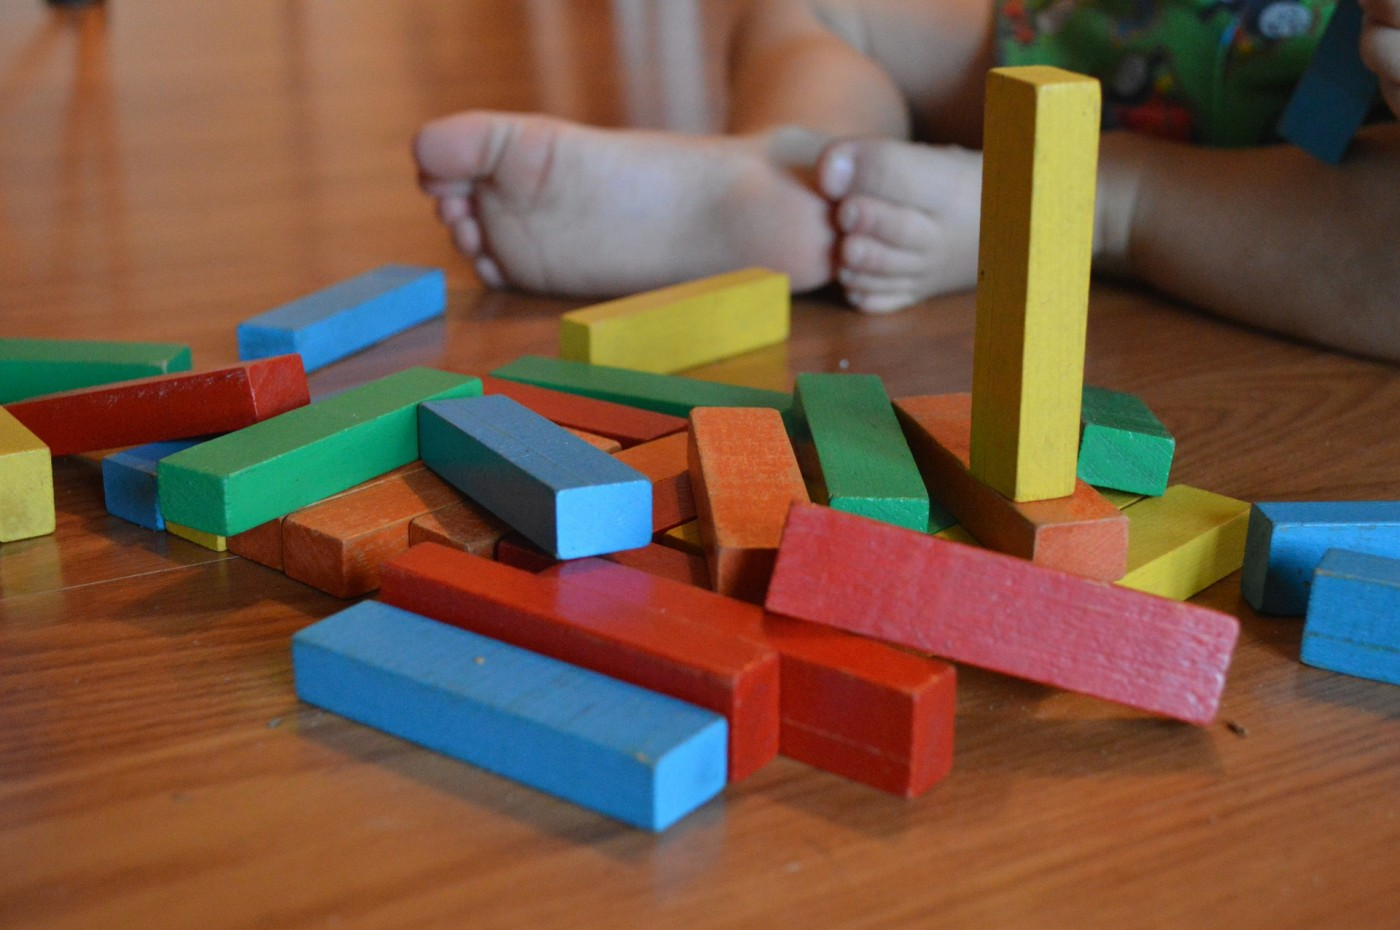 Applying the Montessori method at home